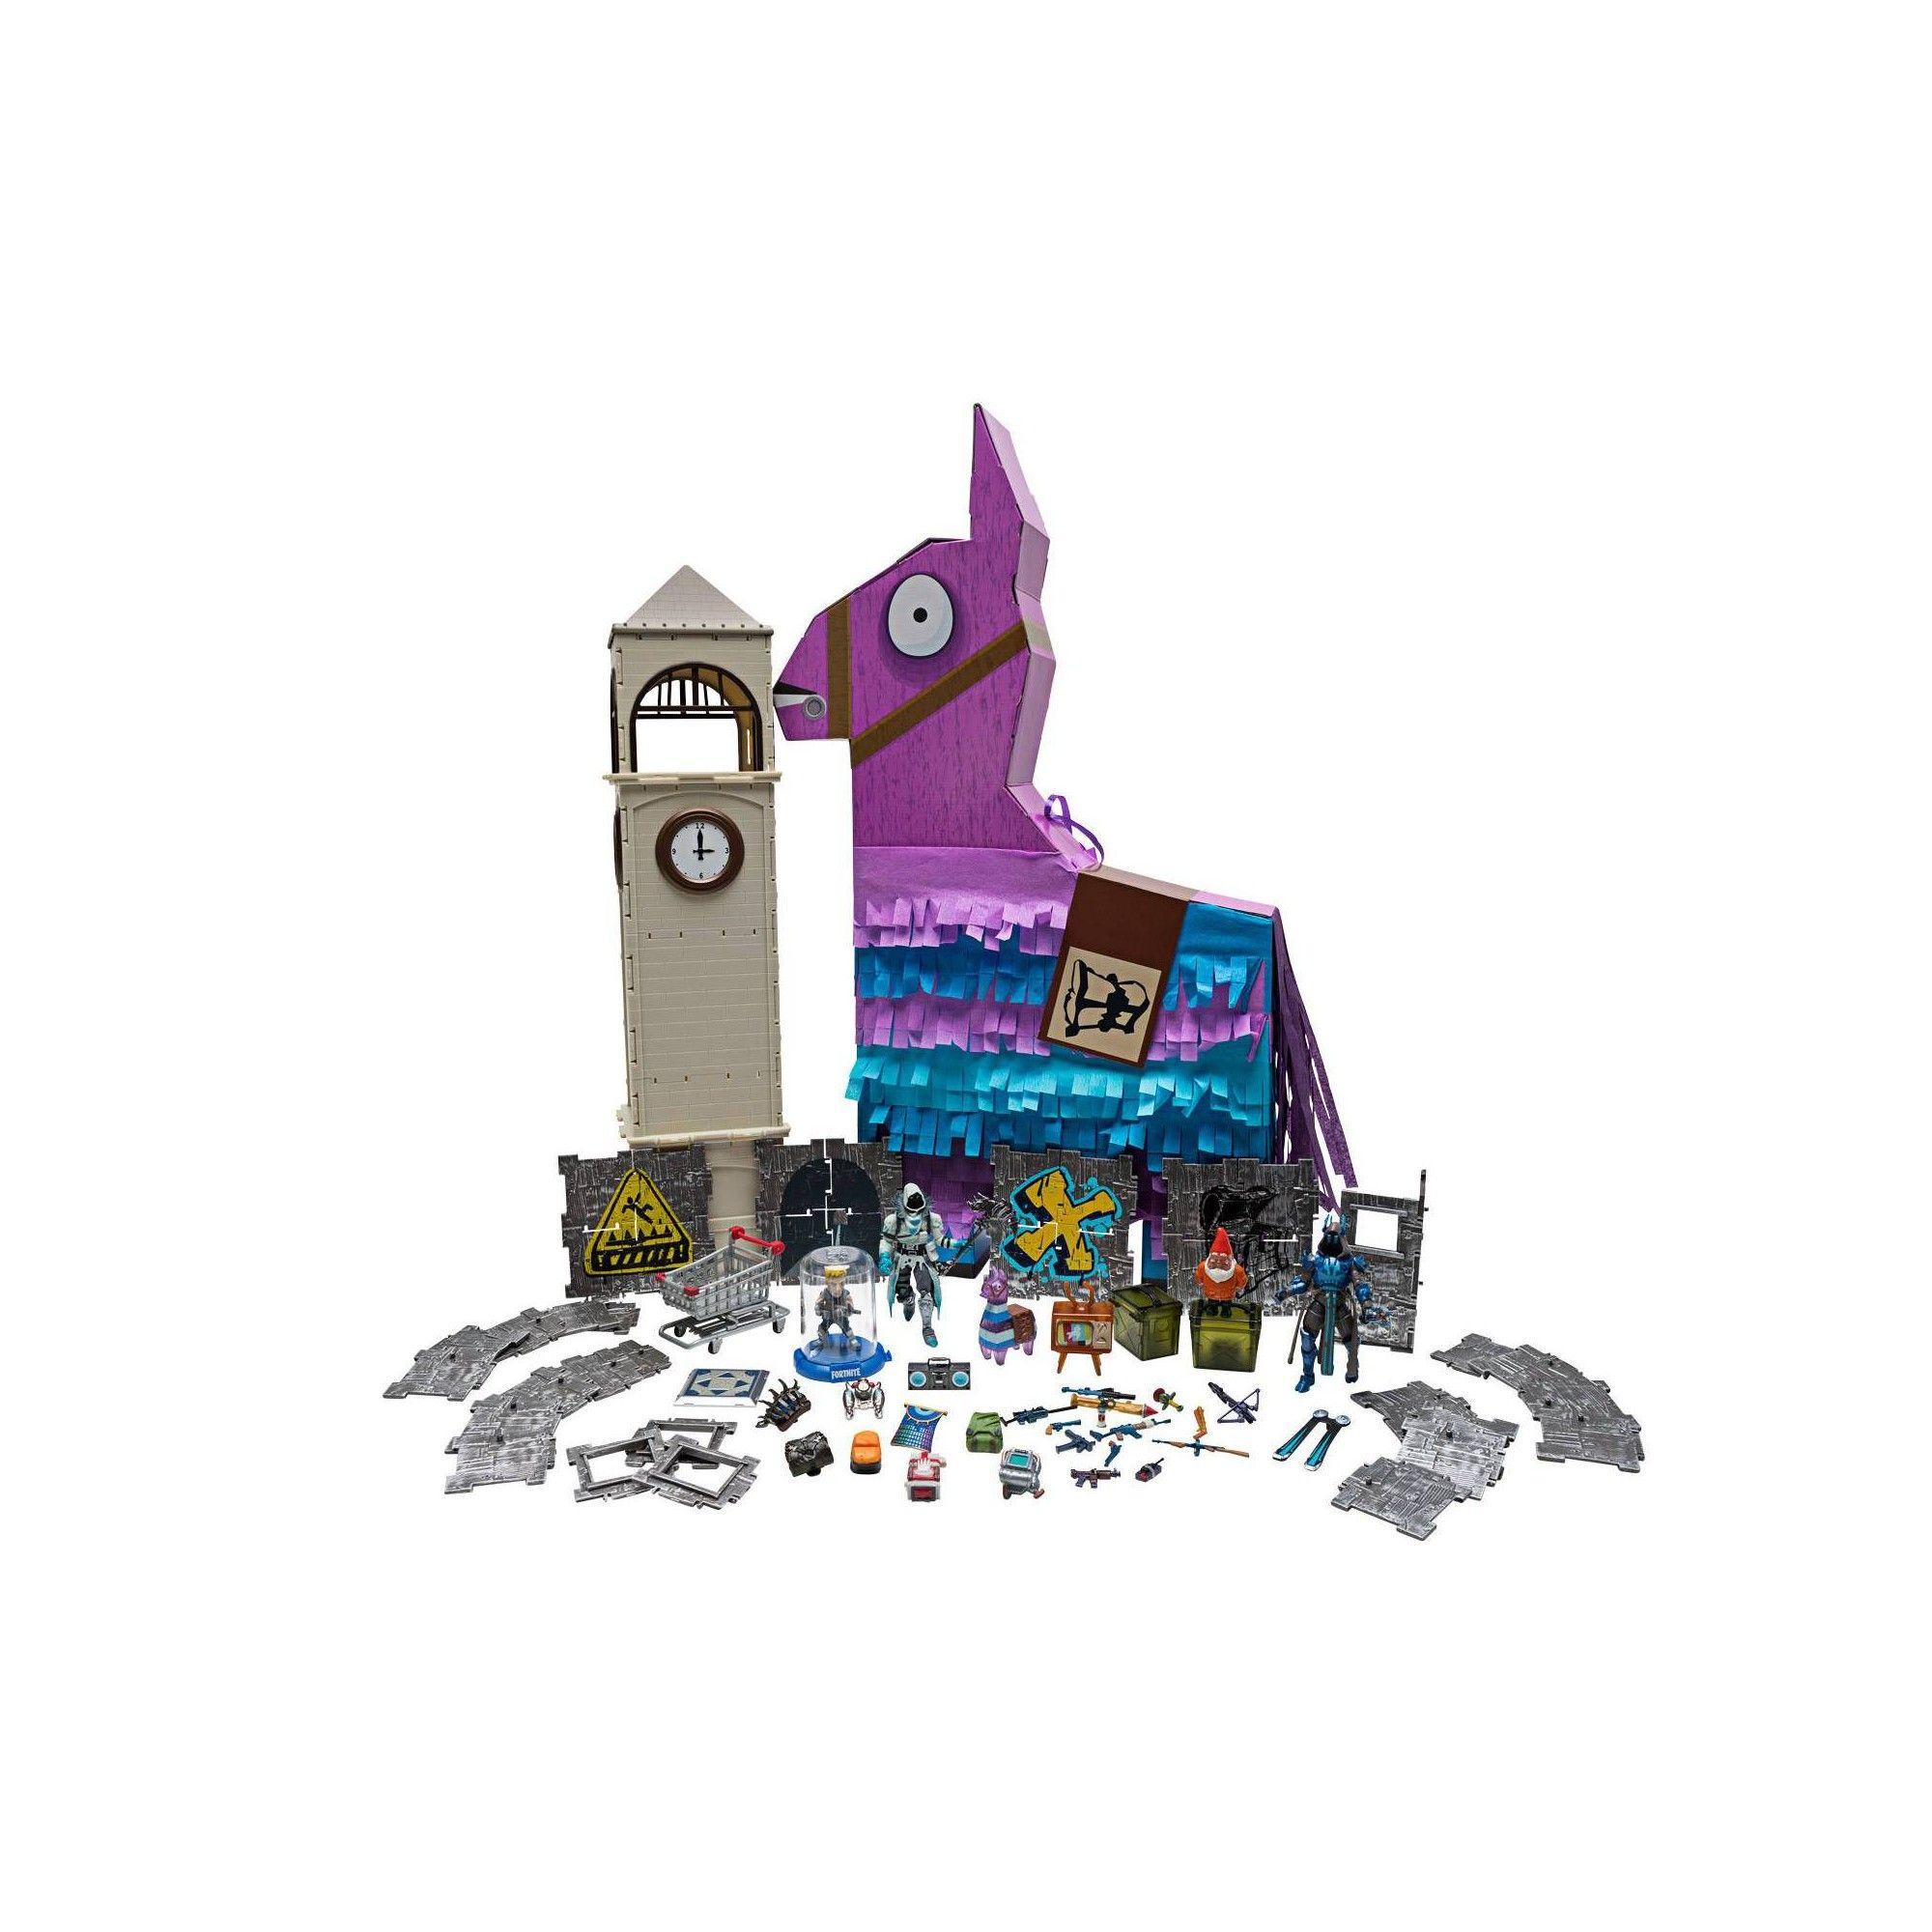 Christmas Loot Pinata 2020 Fortnite Jumbo Llama Loot Pinata in 2020 | Toys for boys, Moose